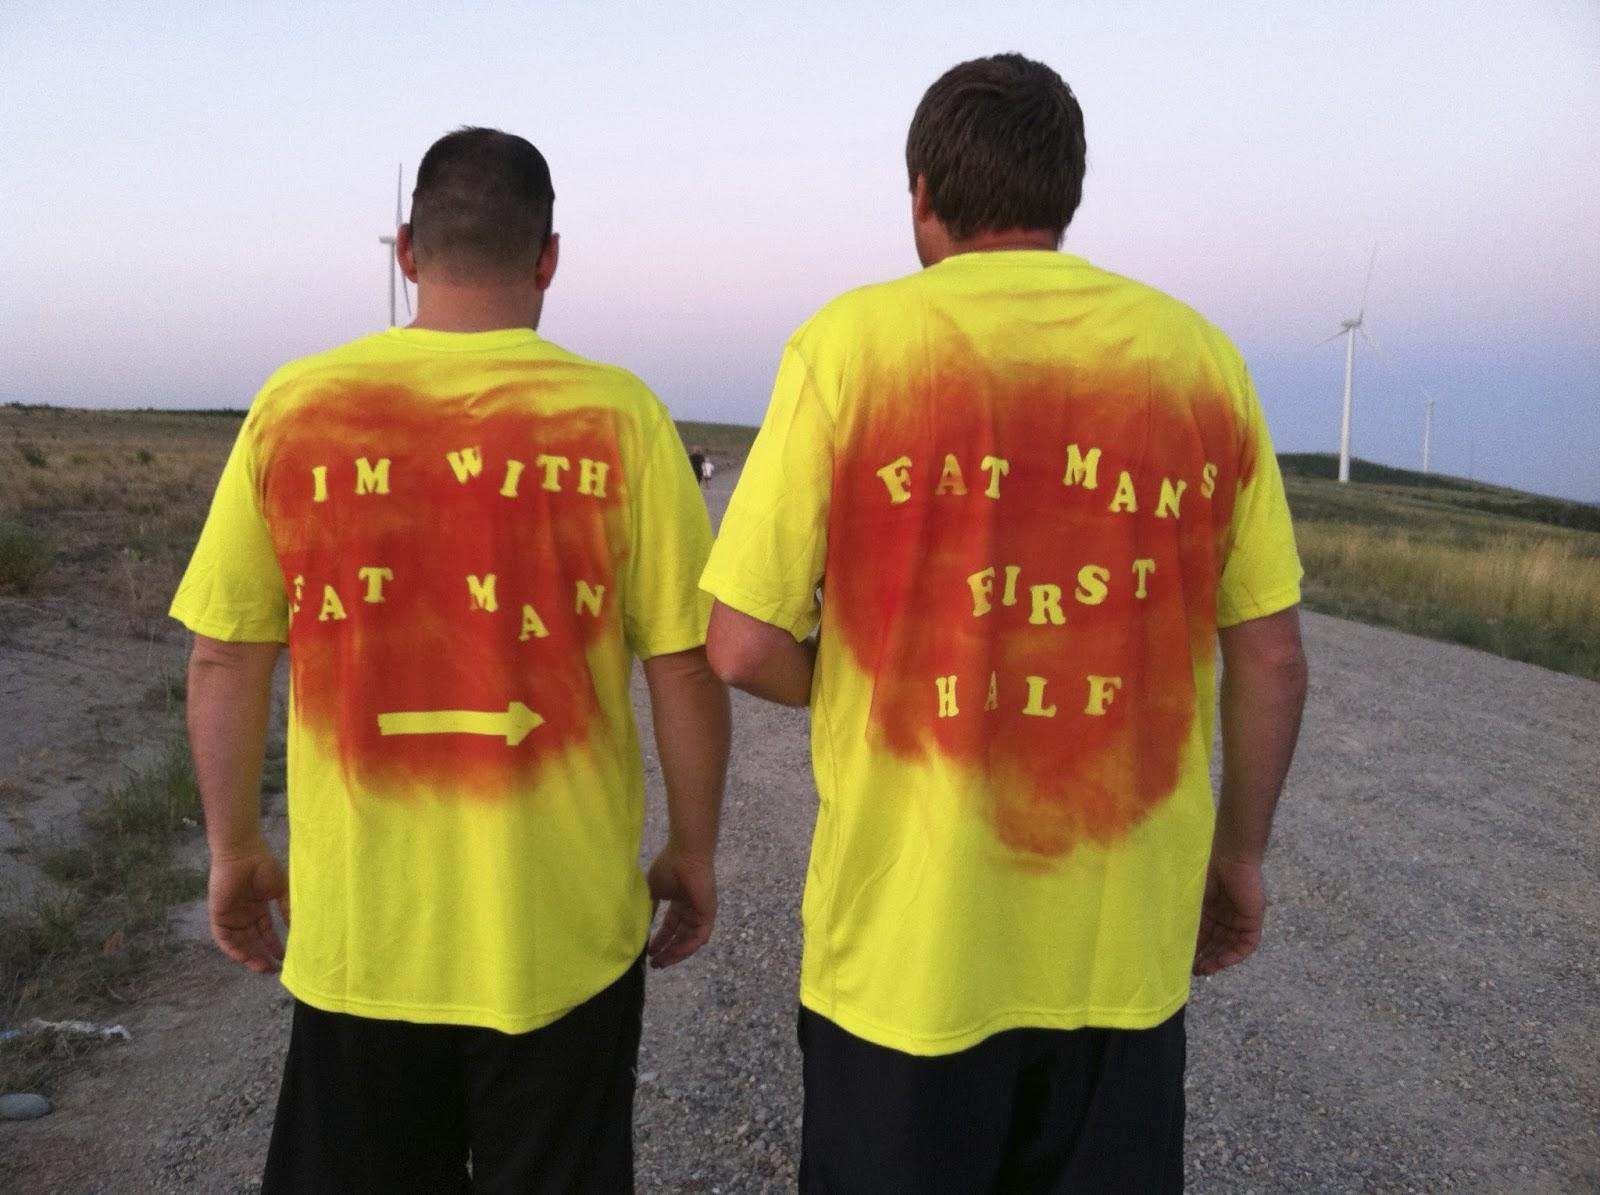 how to prepare yourself to run a half marathon